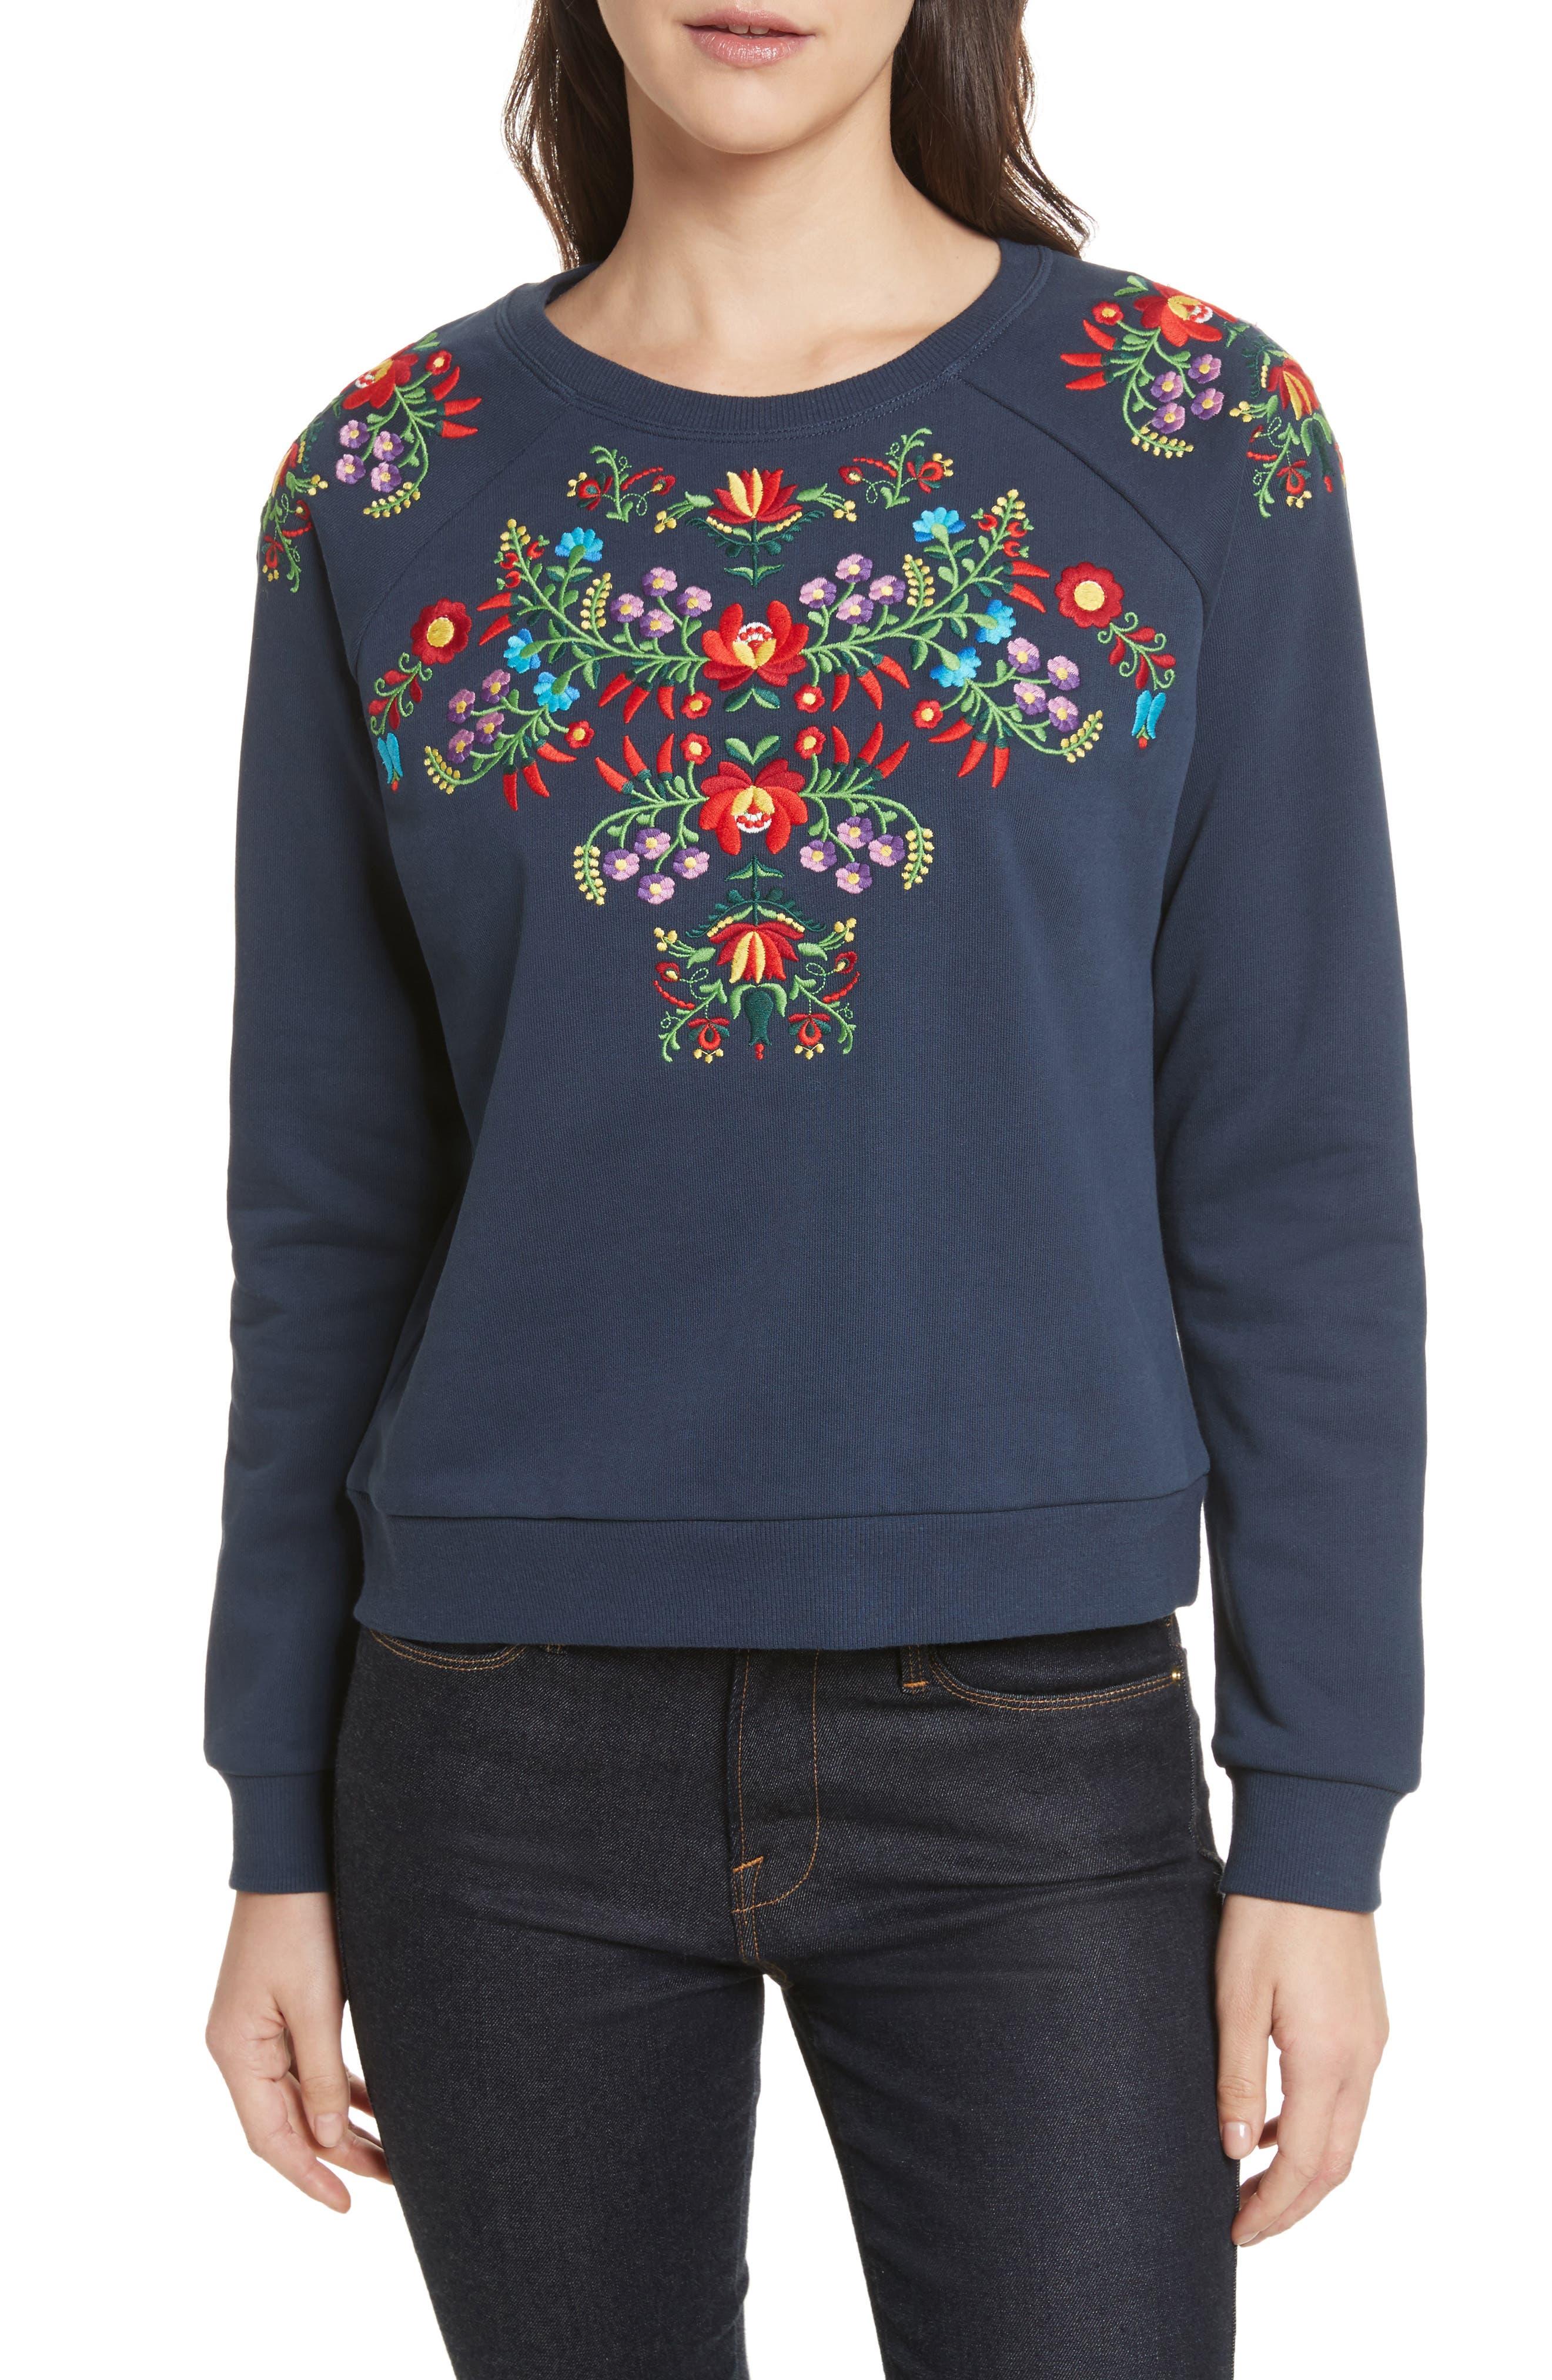 Jennings Sweatshirt,                         Main,                         color, Navy